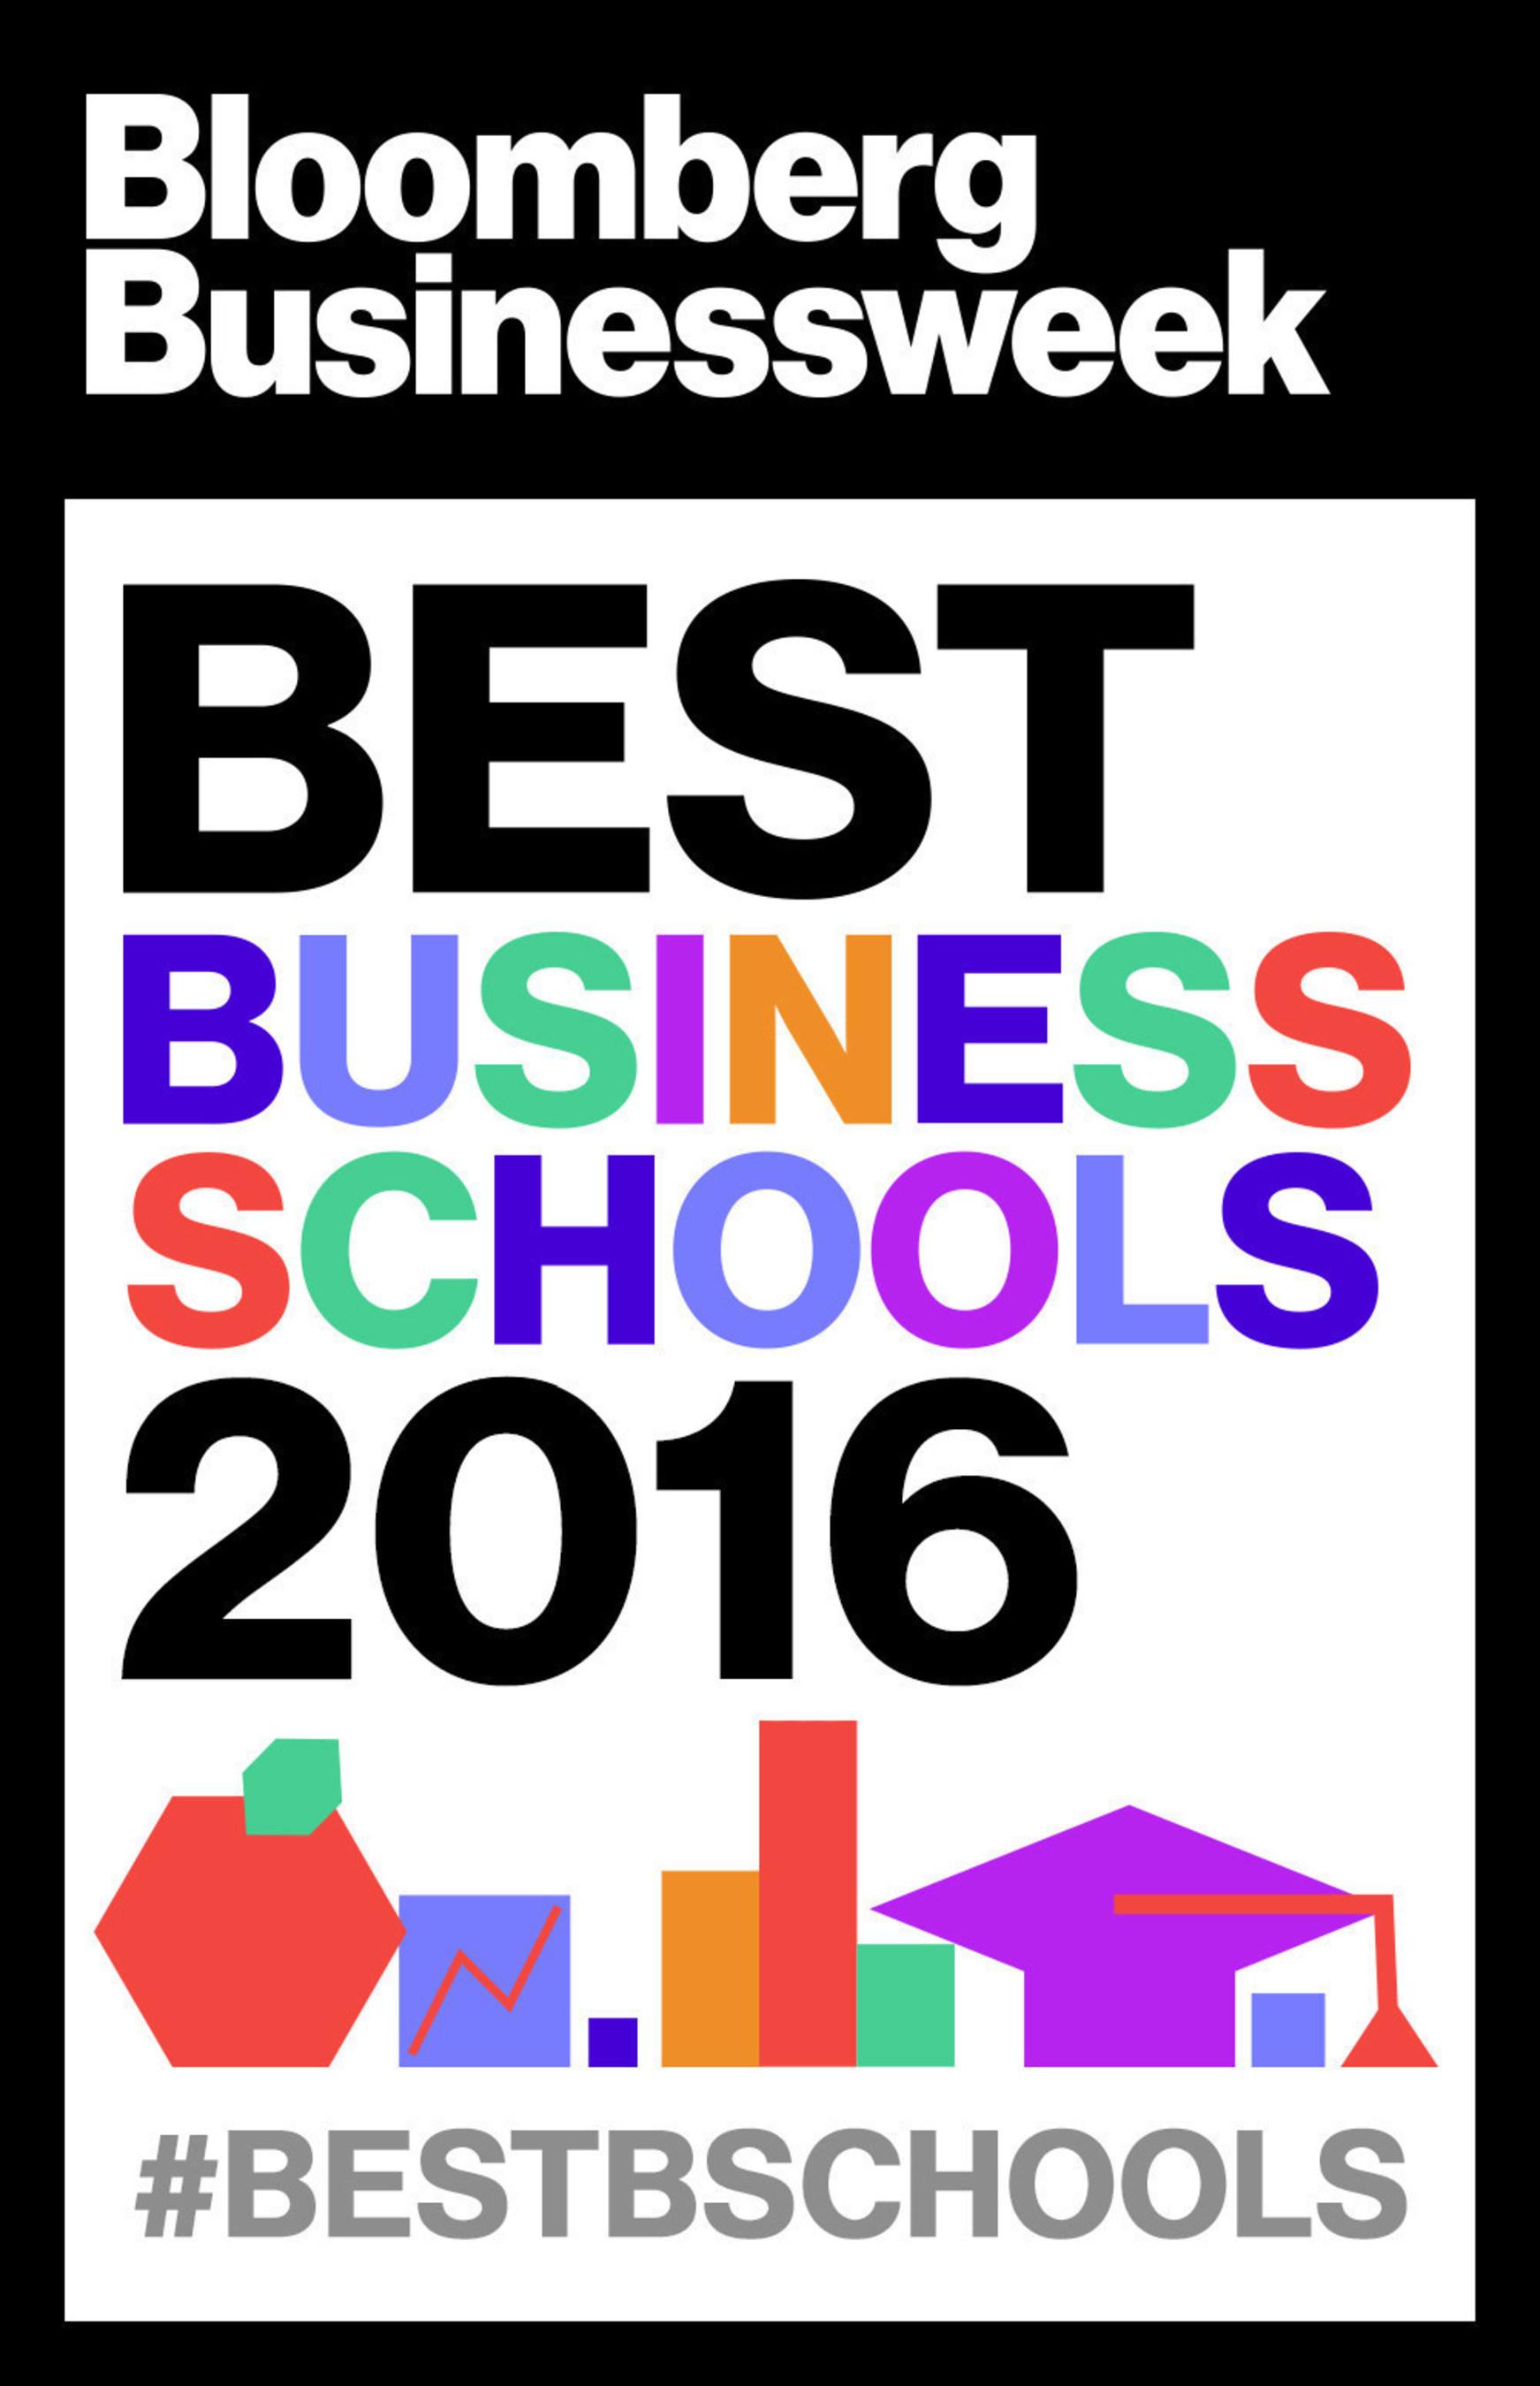 Bloomberg Businessweek releases its 2016 ranking of the best U.S. business schools